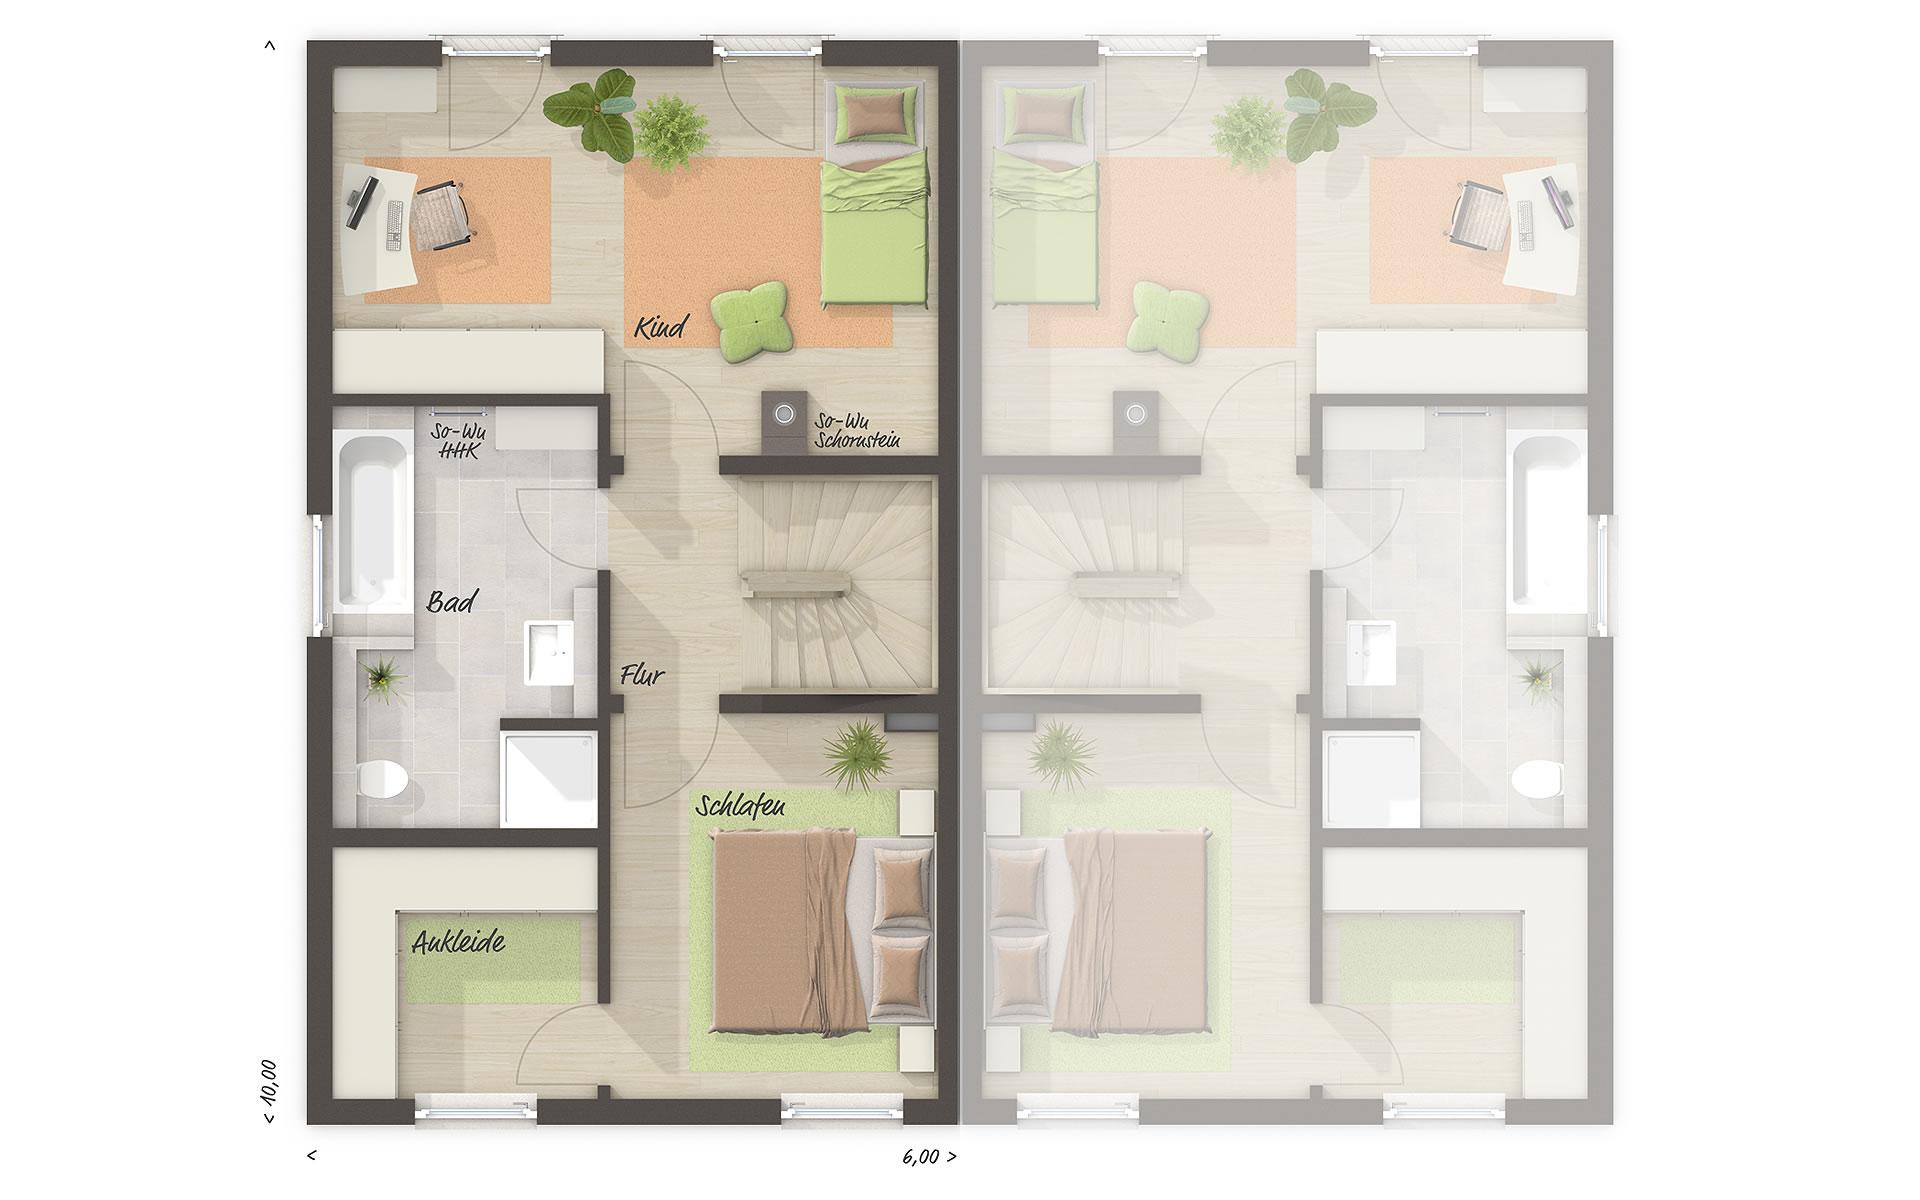 Obergeschoss Doppelhaus Mainz 128 - modern von Town & Country Haus Lizenzgeber GmbH